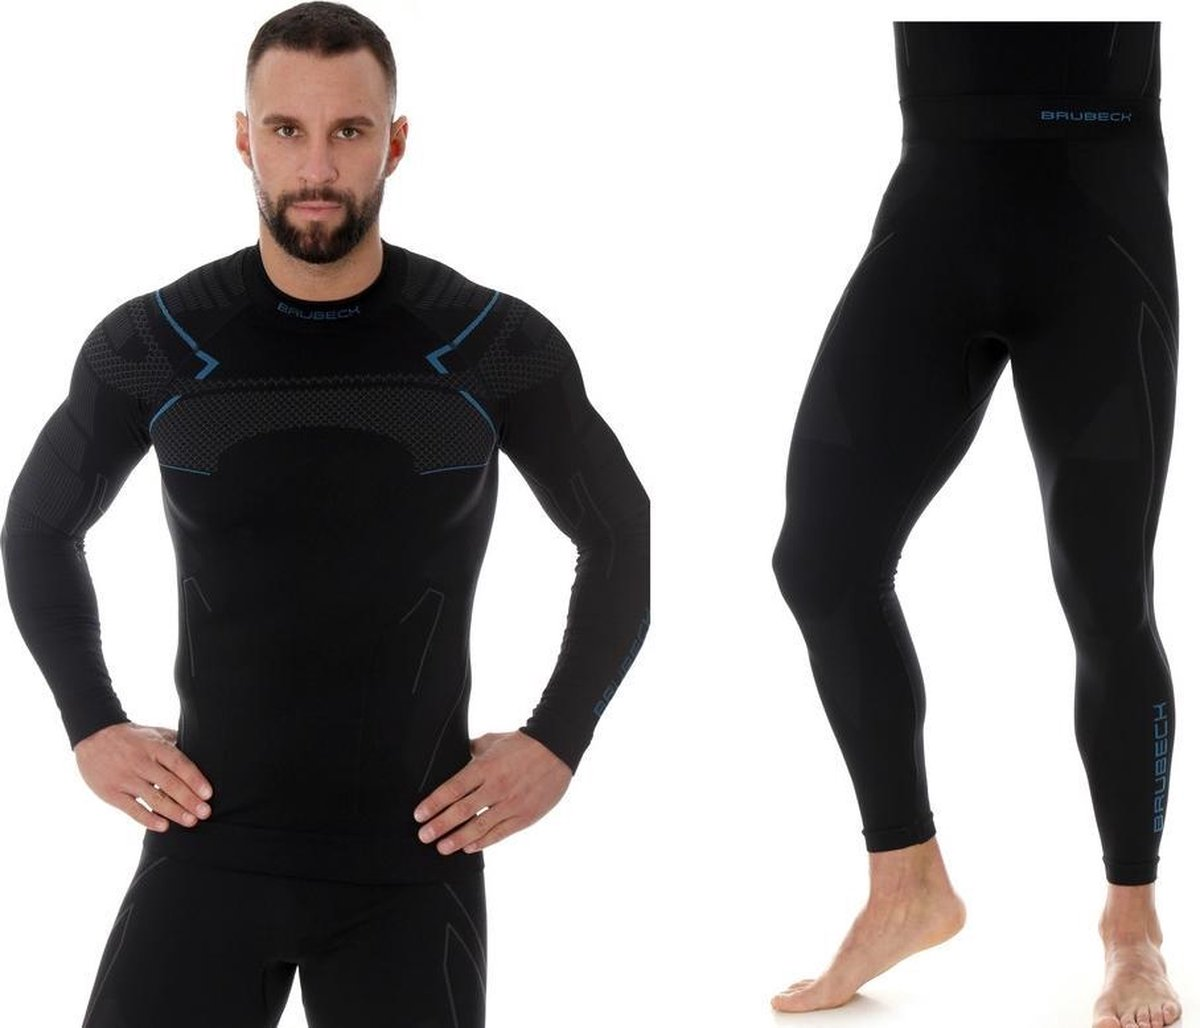 Brubeck Heren Thermokleding Set - met Nilit® Heat - Zwart/Blauw - XXL